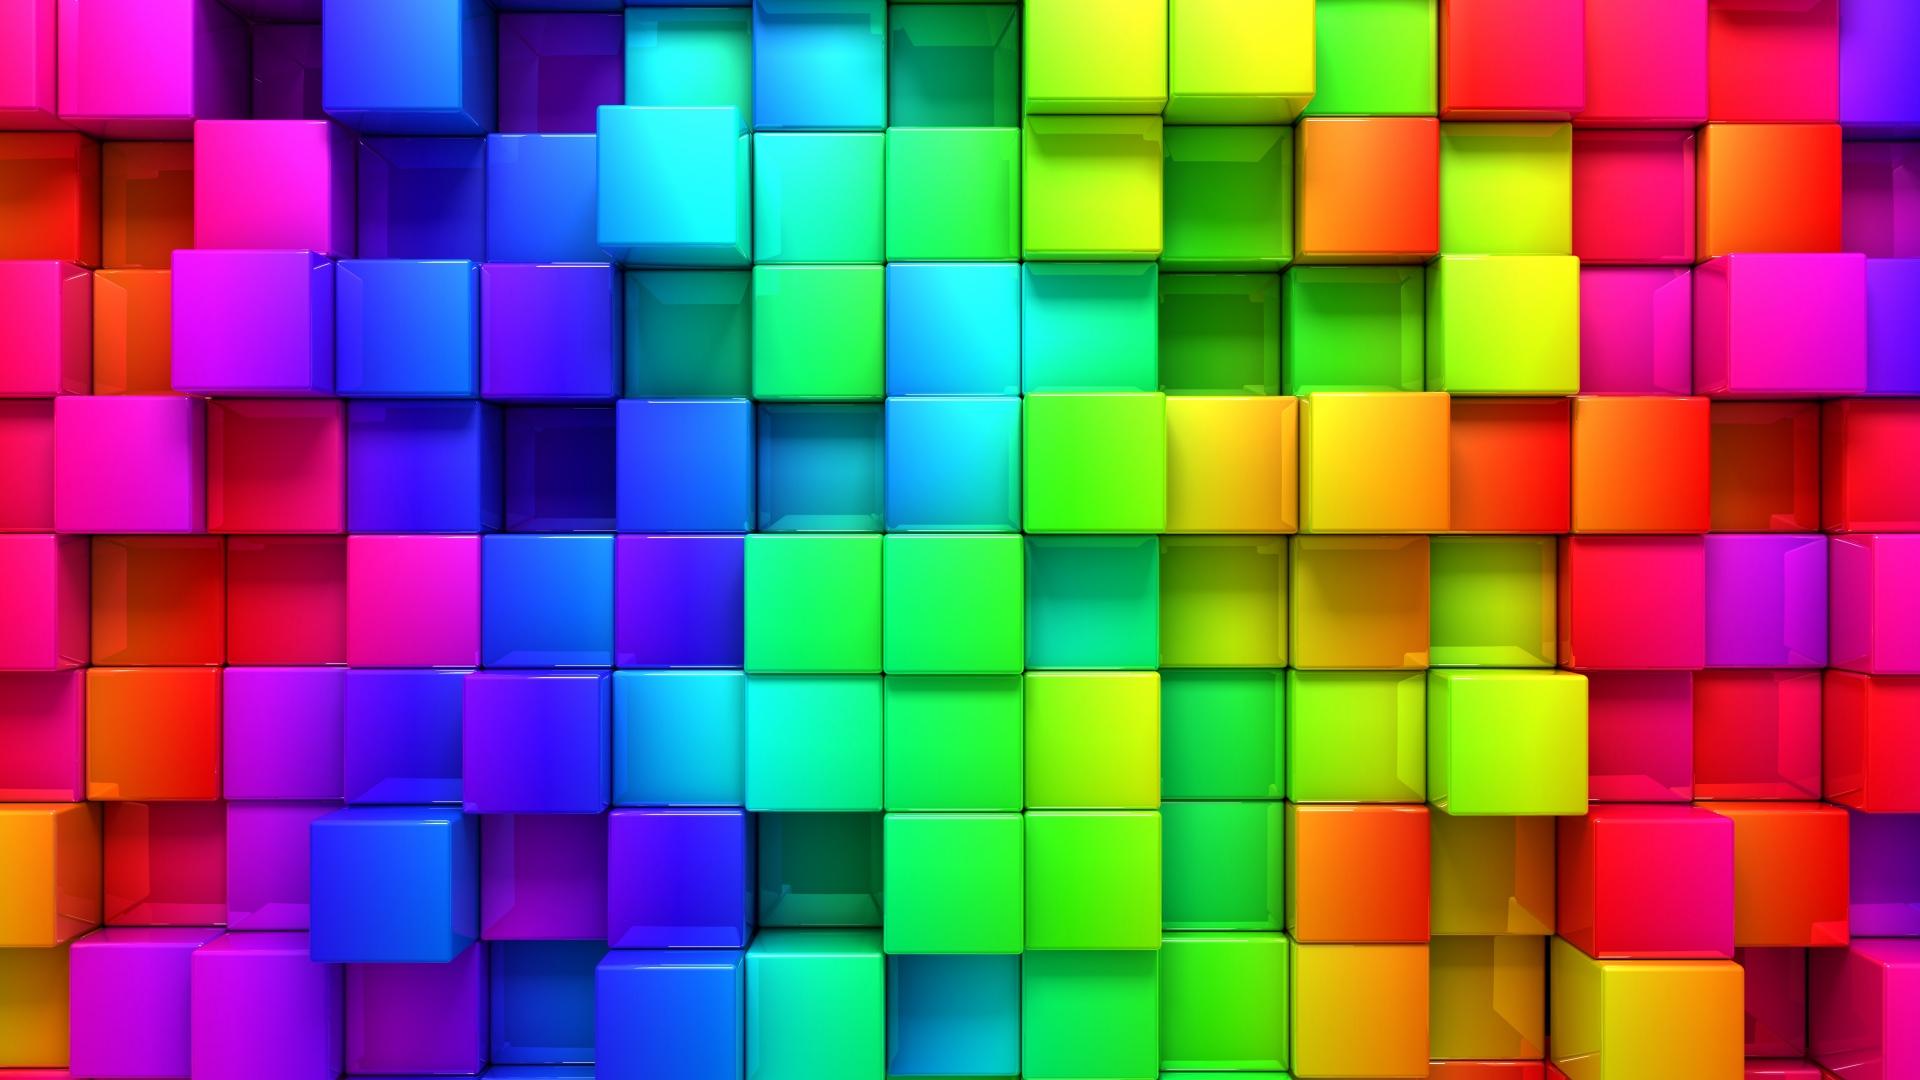 desktop full hd wallpaper